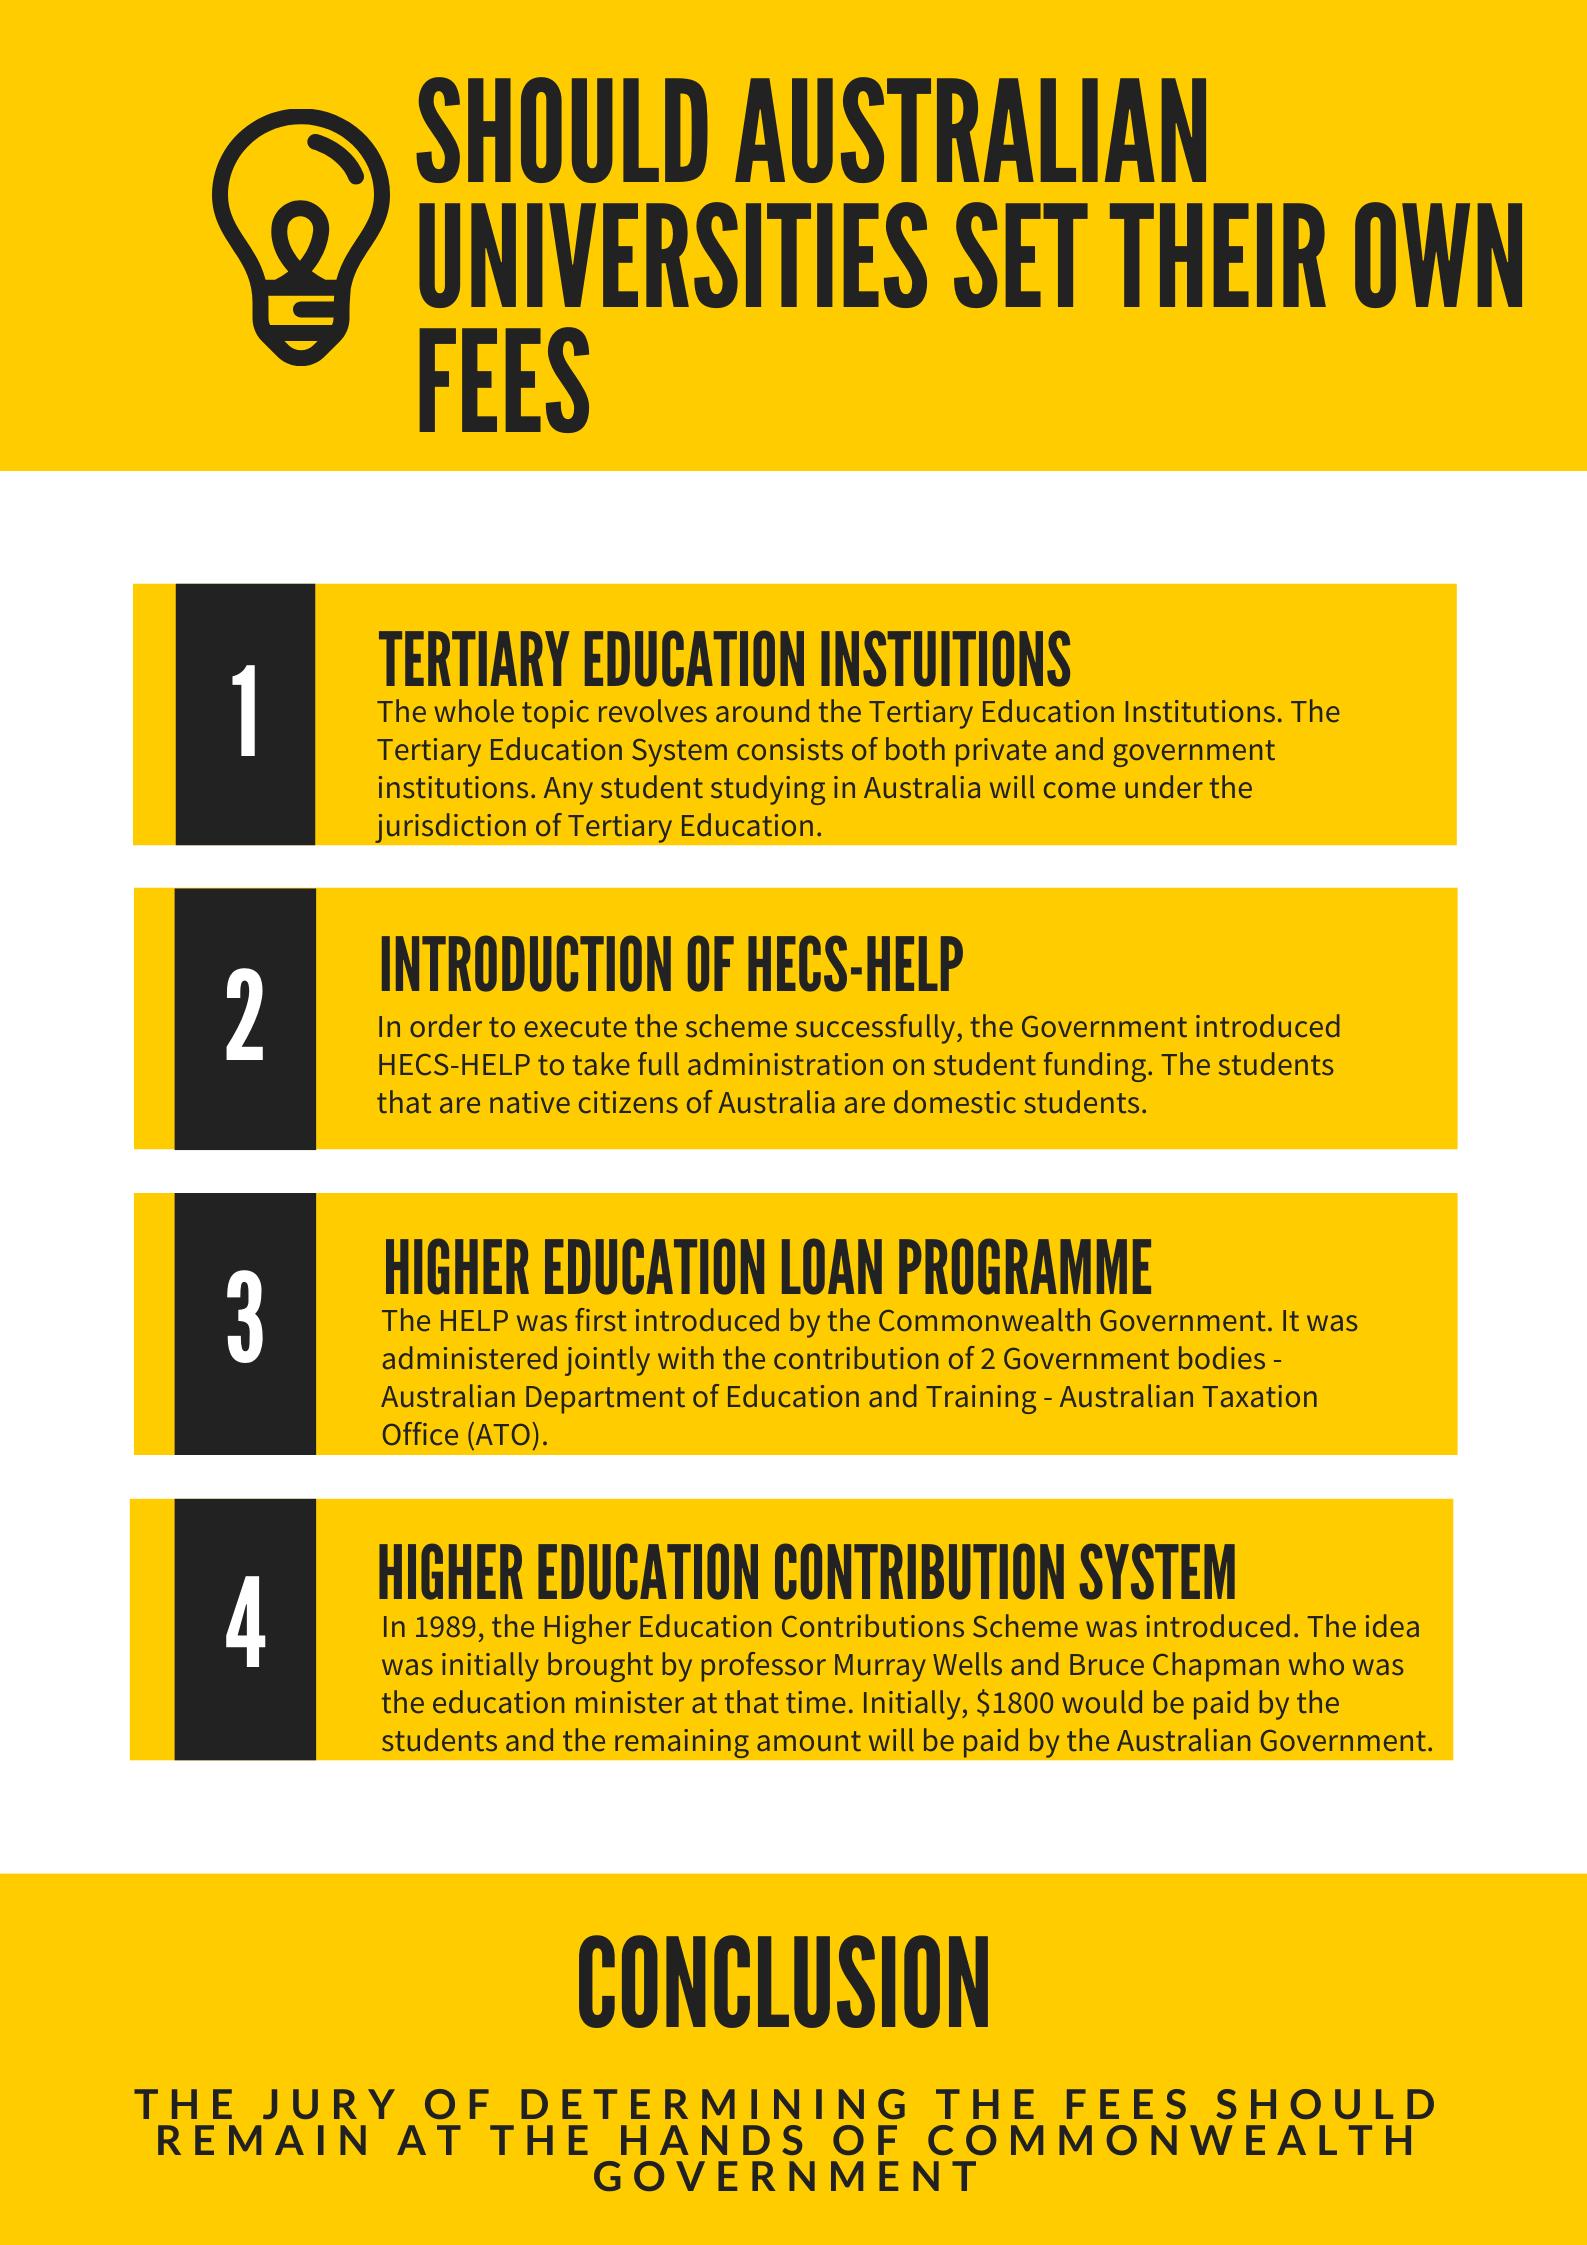 Should Australian Universities Set Their Own Fees